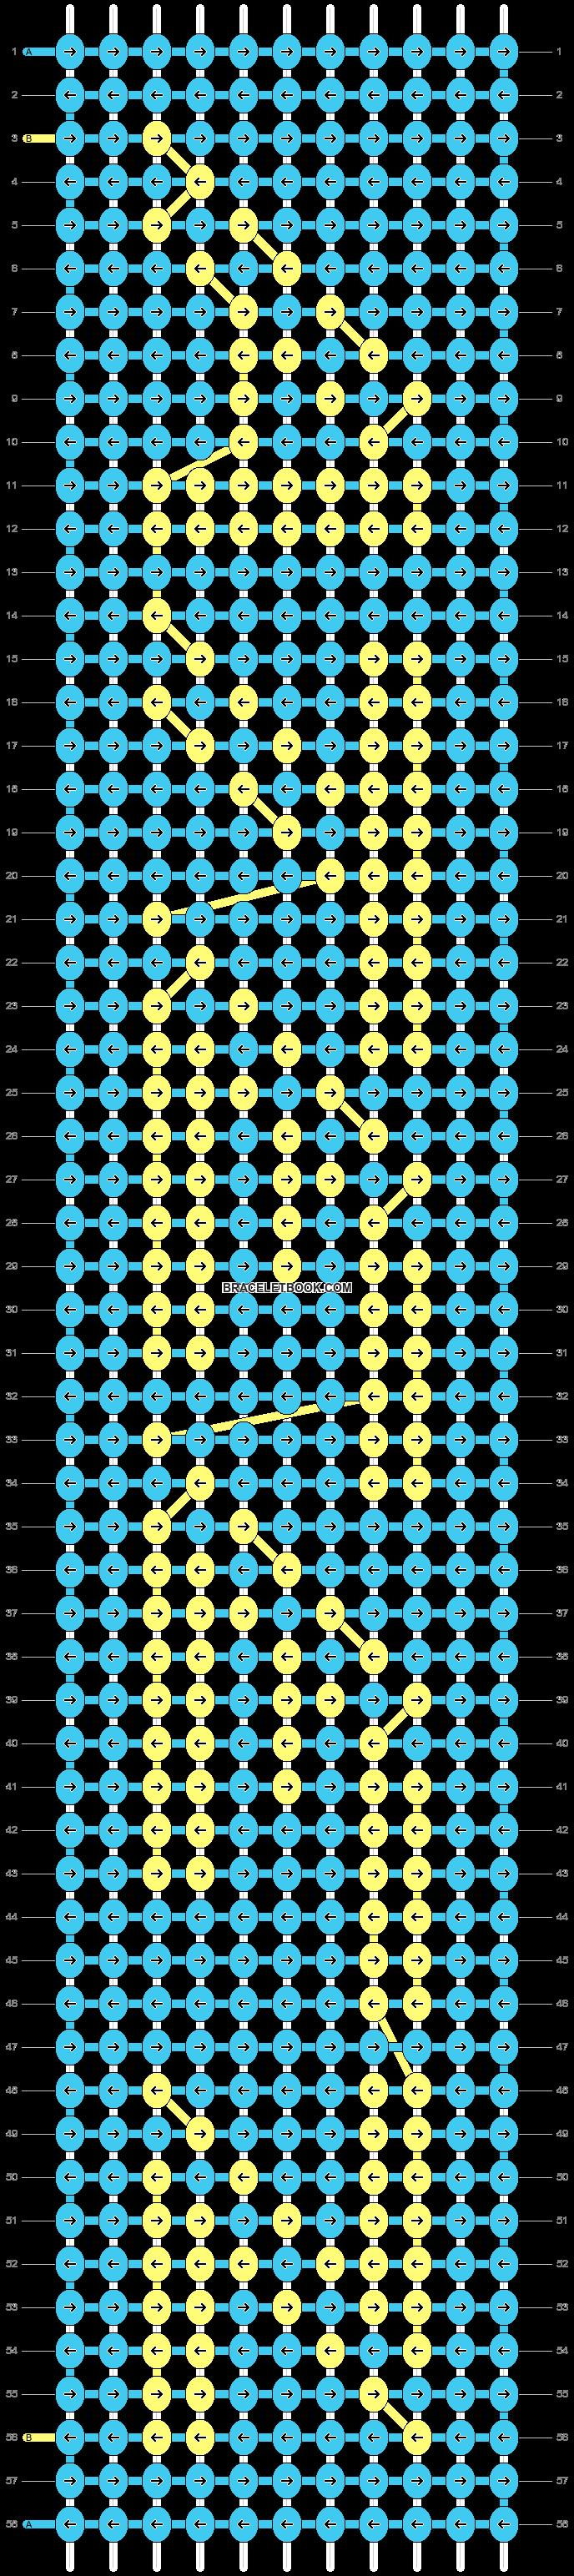 Alpha pattern #50793 pattern